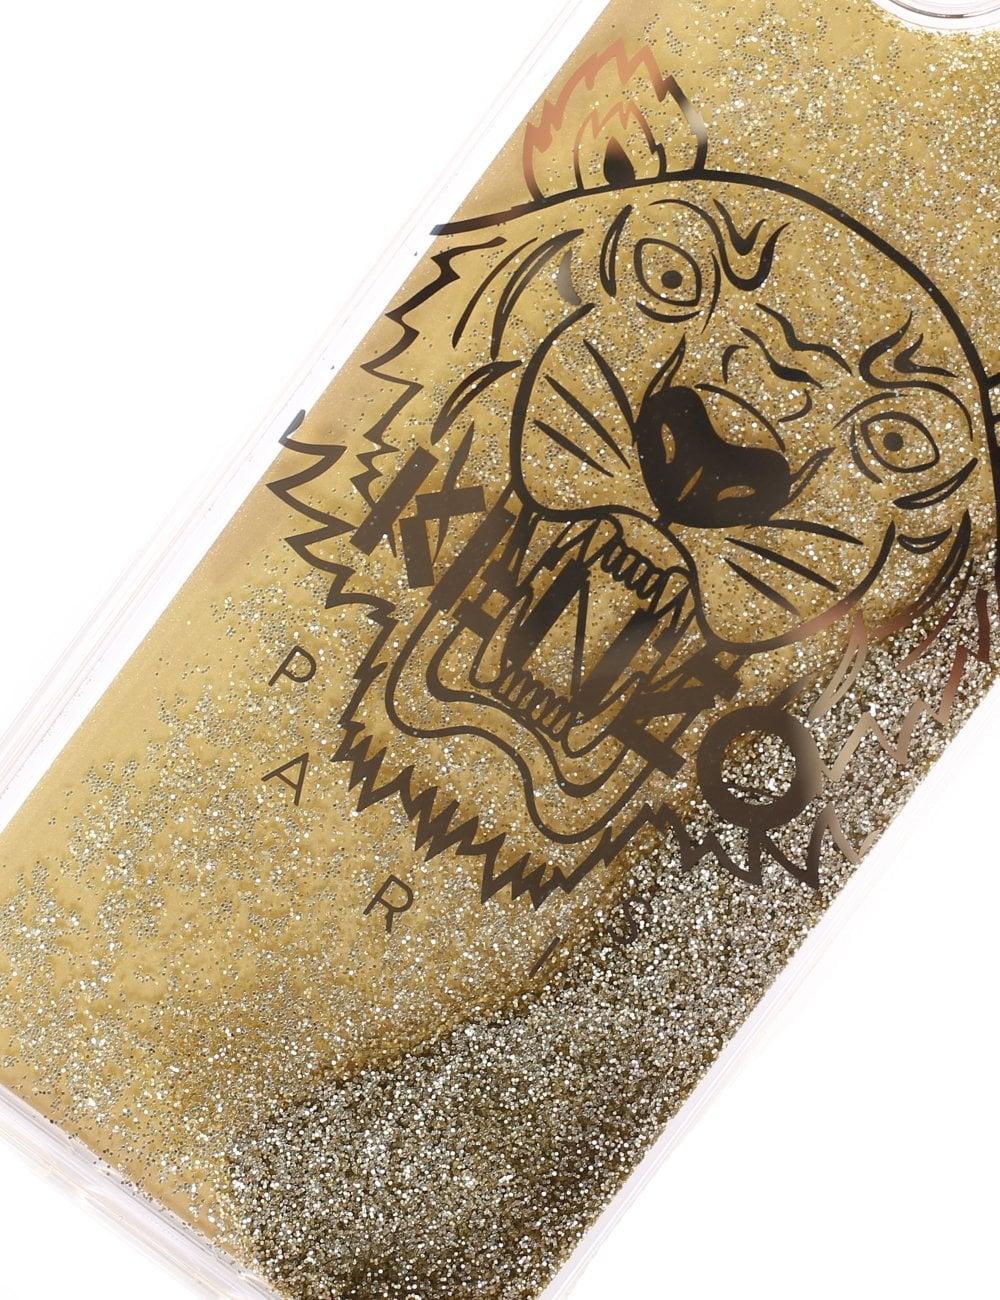 e4a1a453fa Kenzo Unisex Iphone XS Max Tiger Case